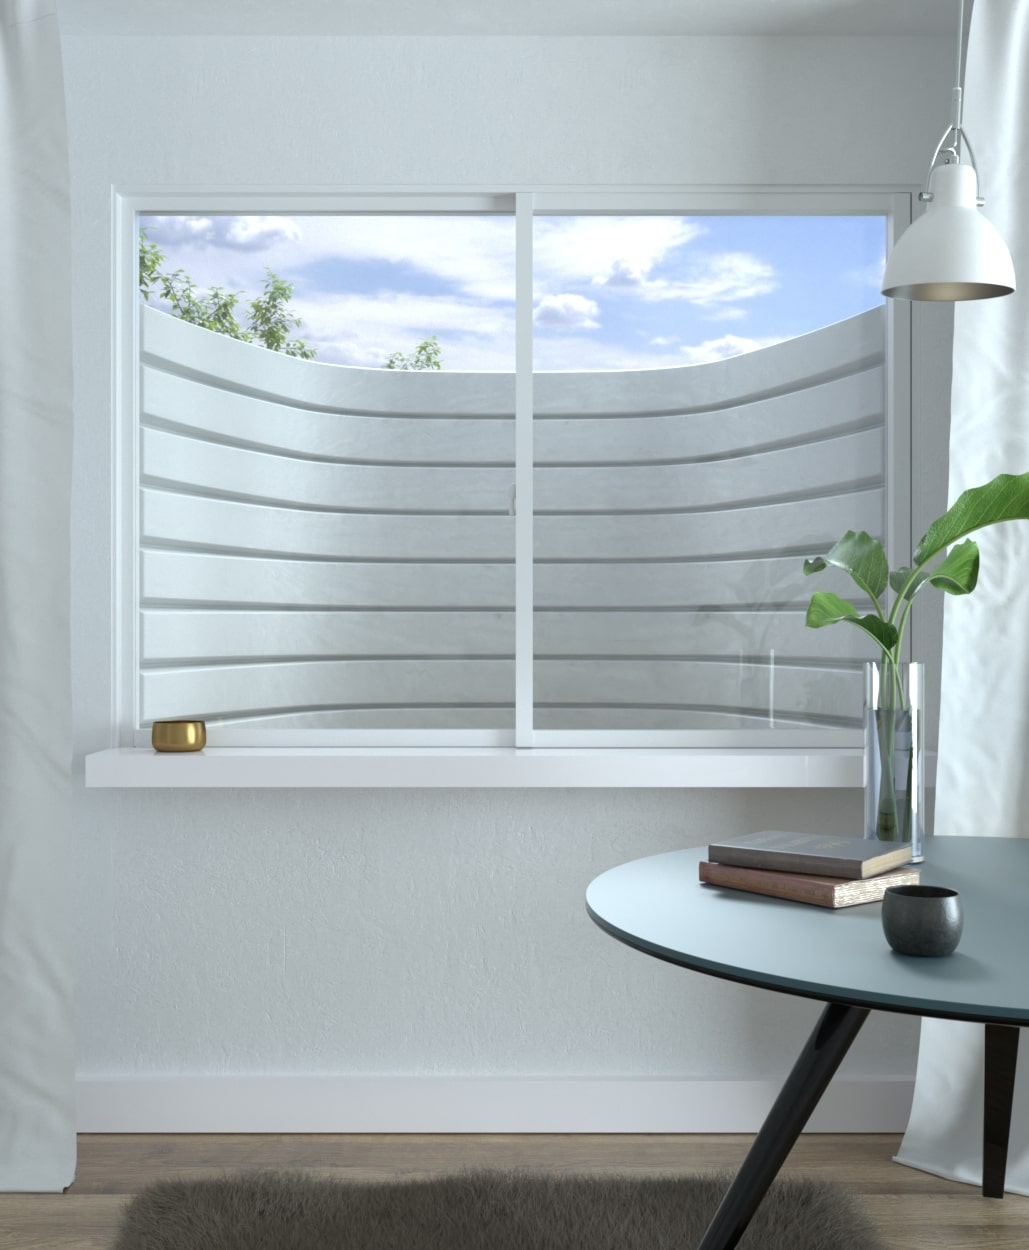 Denali Series Egress Window Wells built by RockWell egress window wells, covers, grates, ladders, and accessories, Dent free